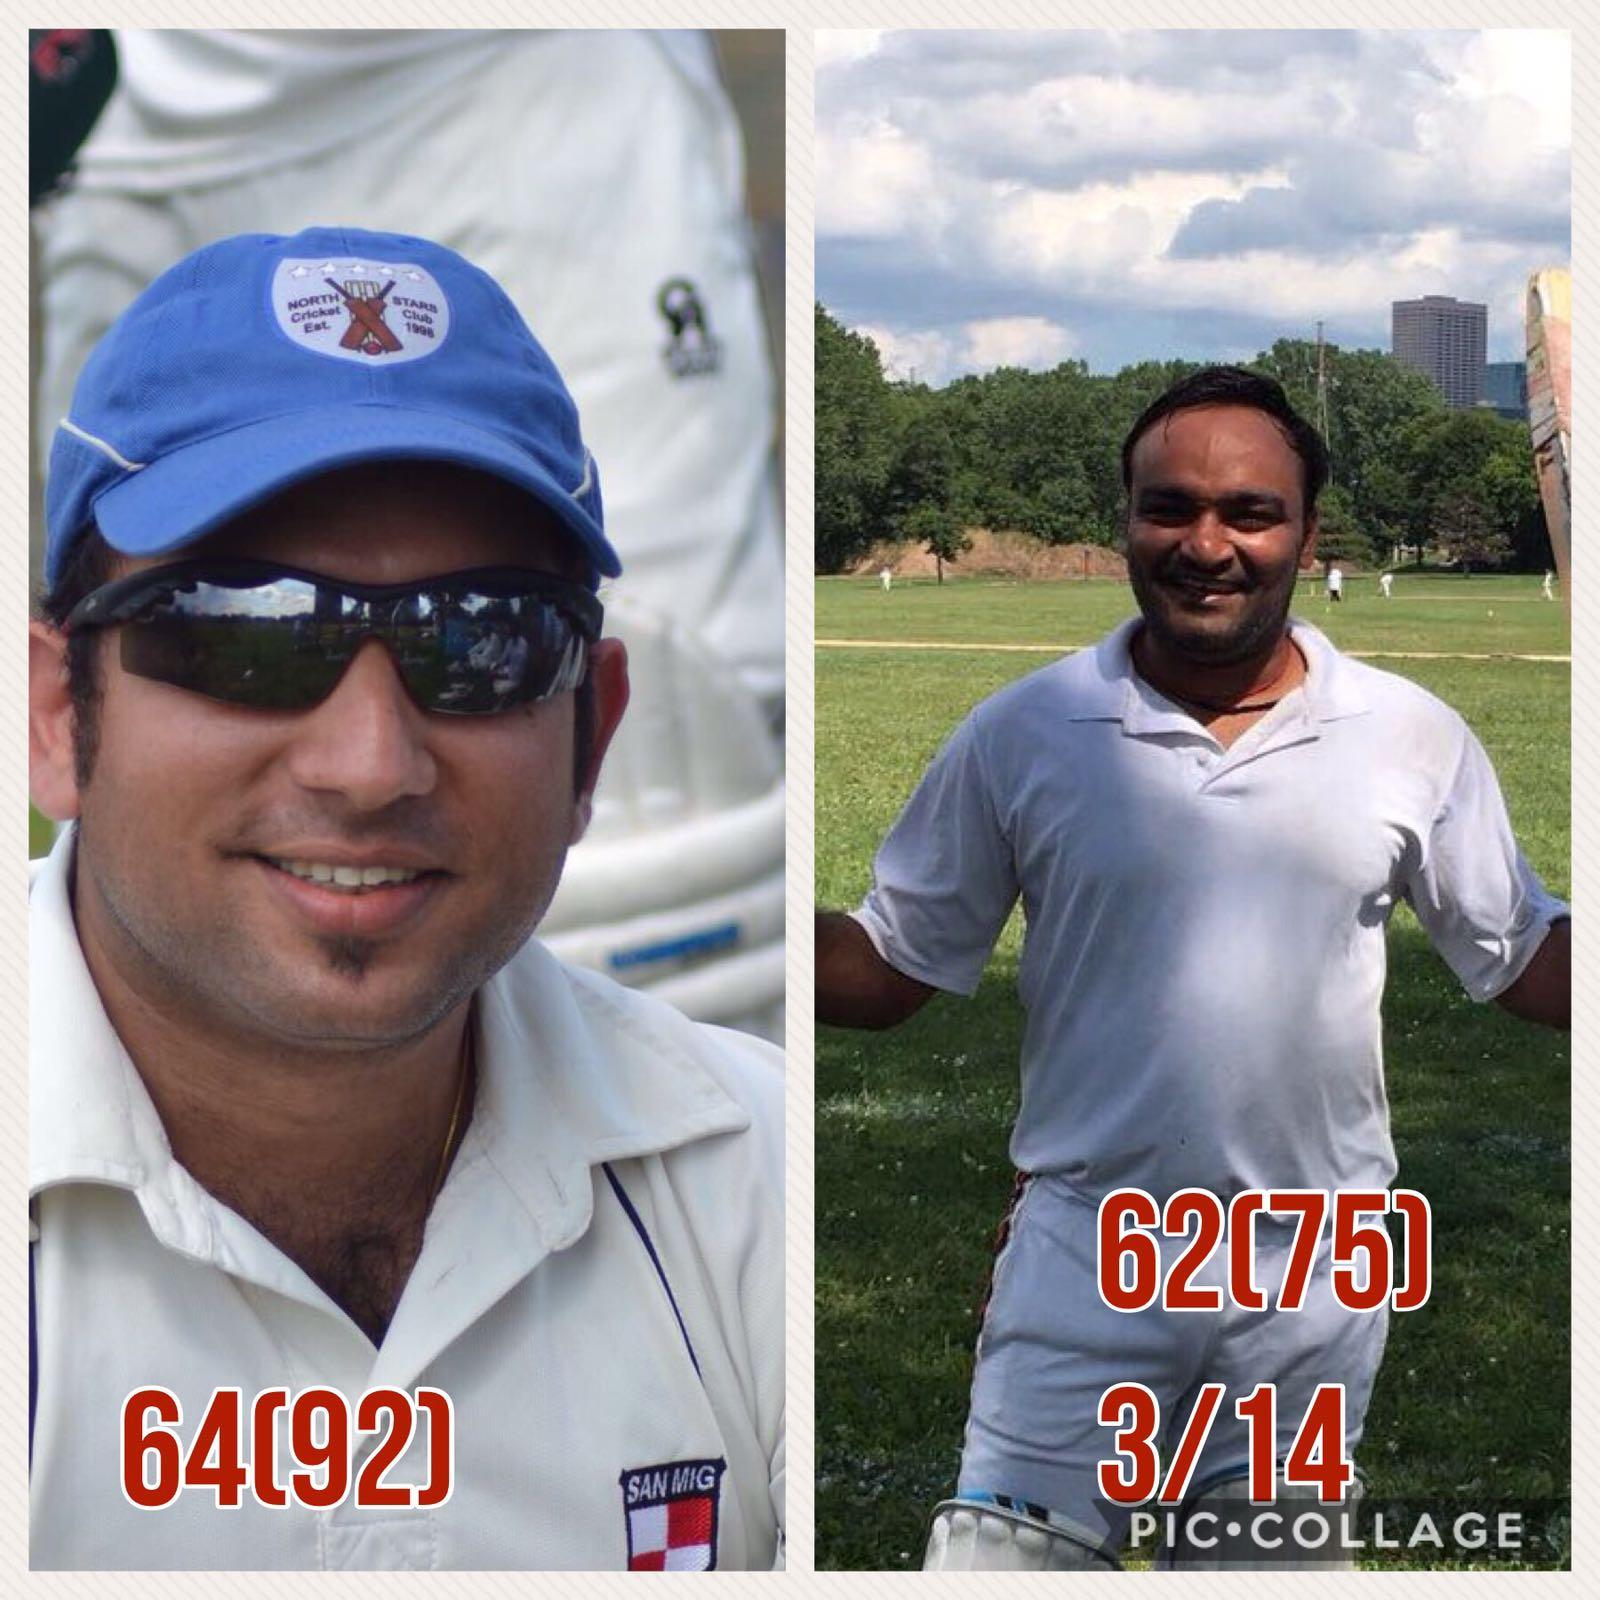 Vijay's heroics and Gagan's steady innings leads Rising Stars to third consecutive win.